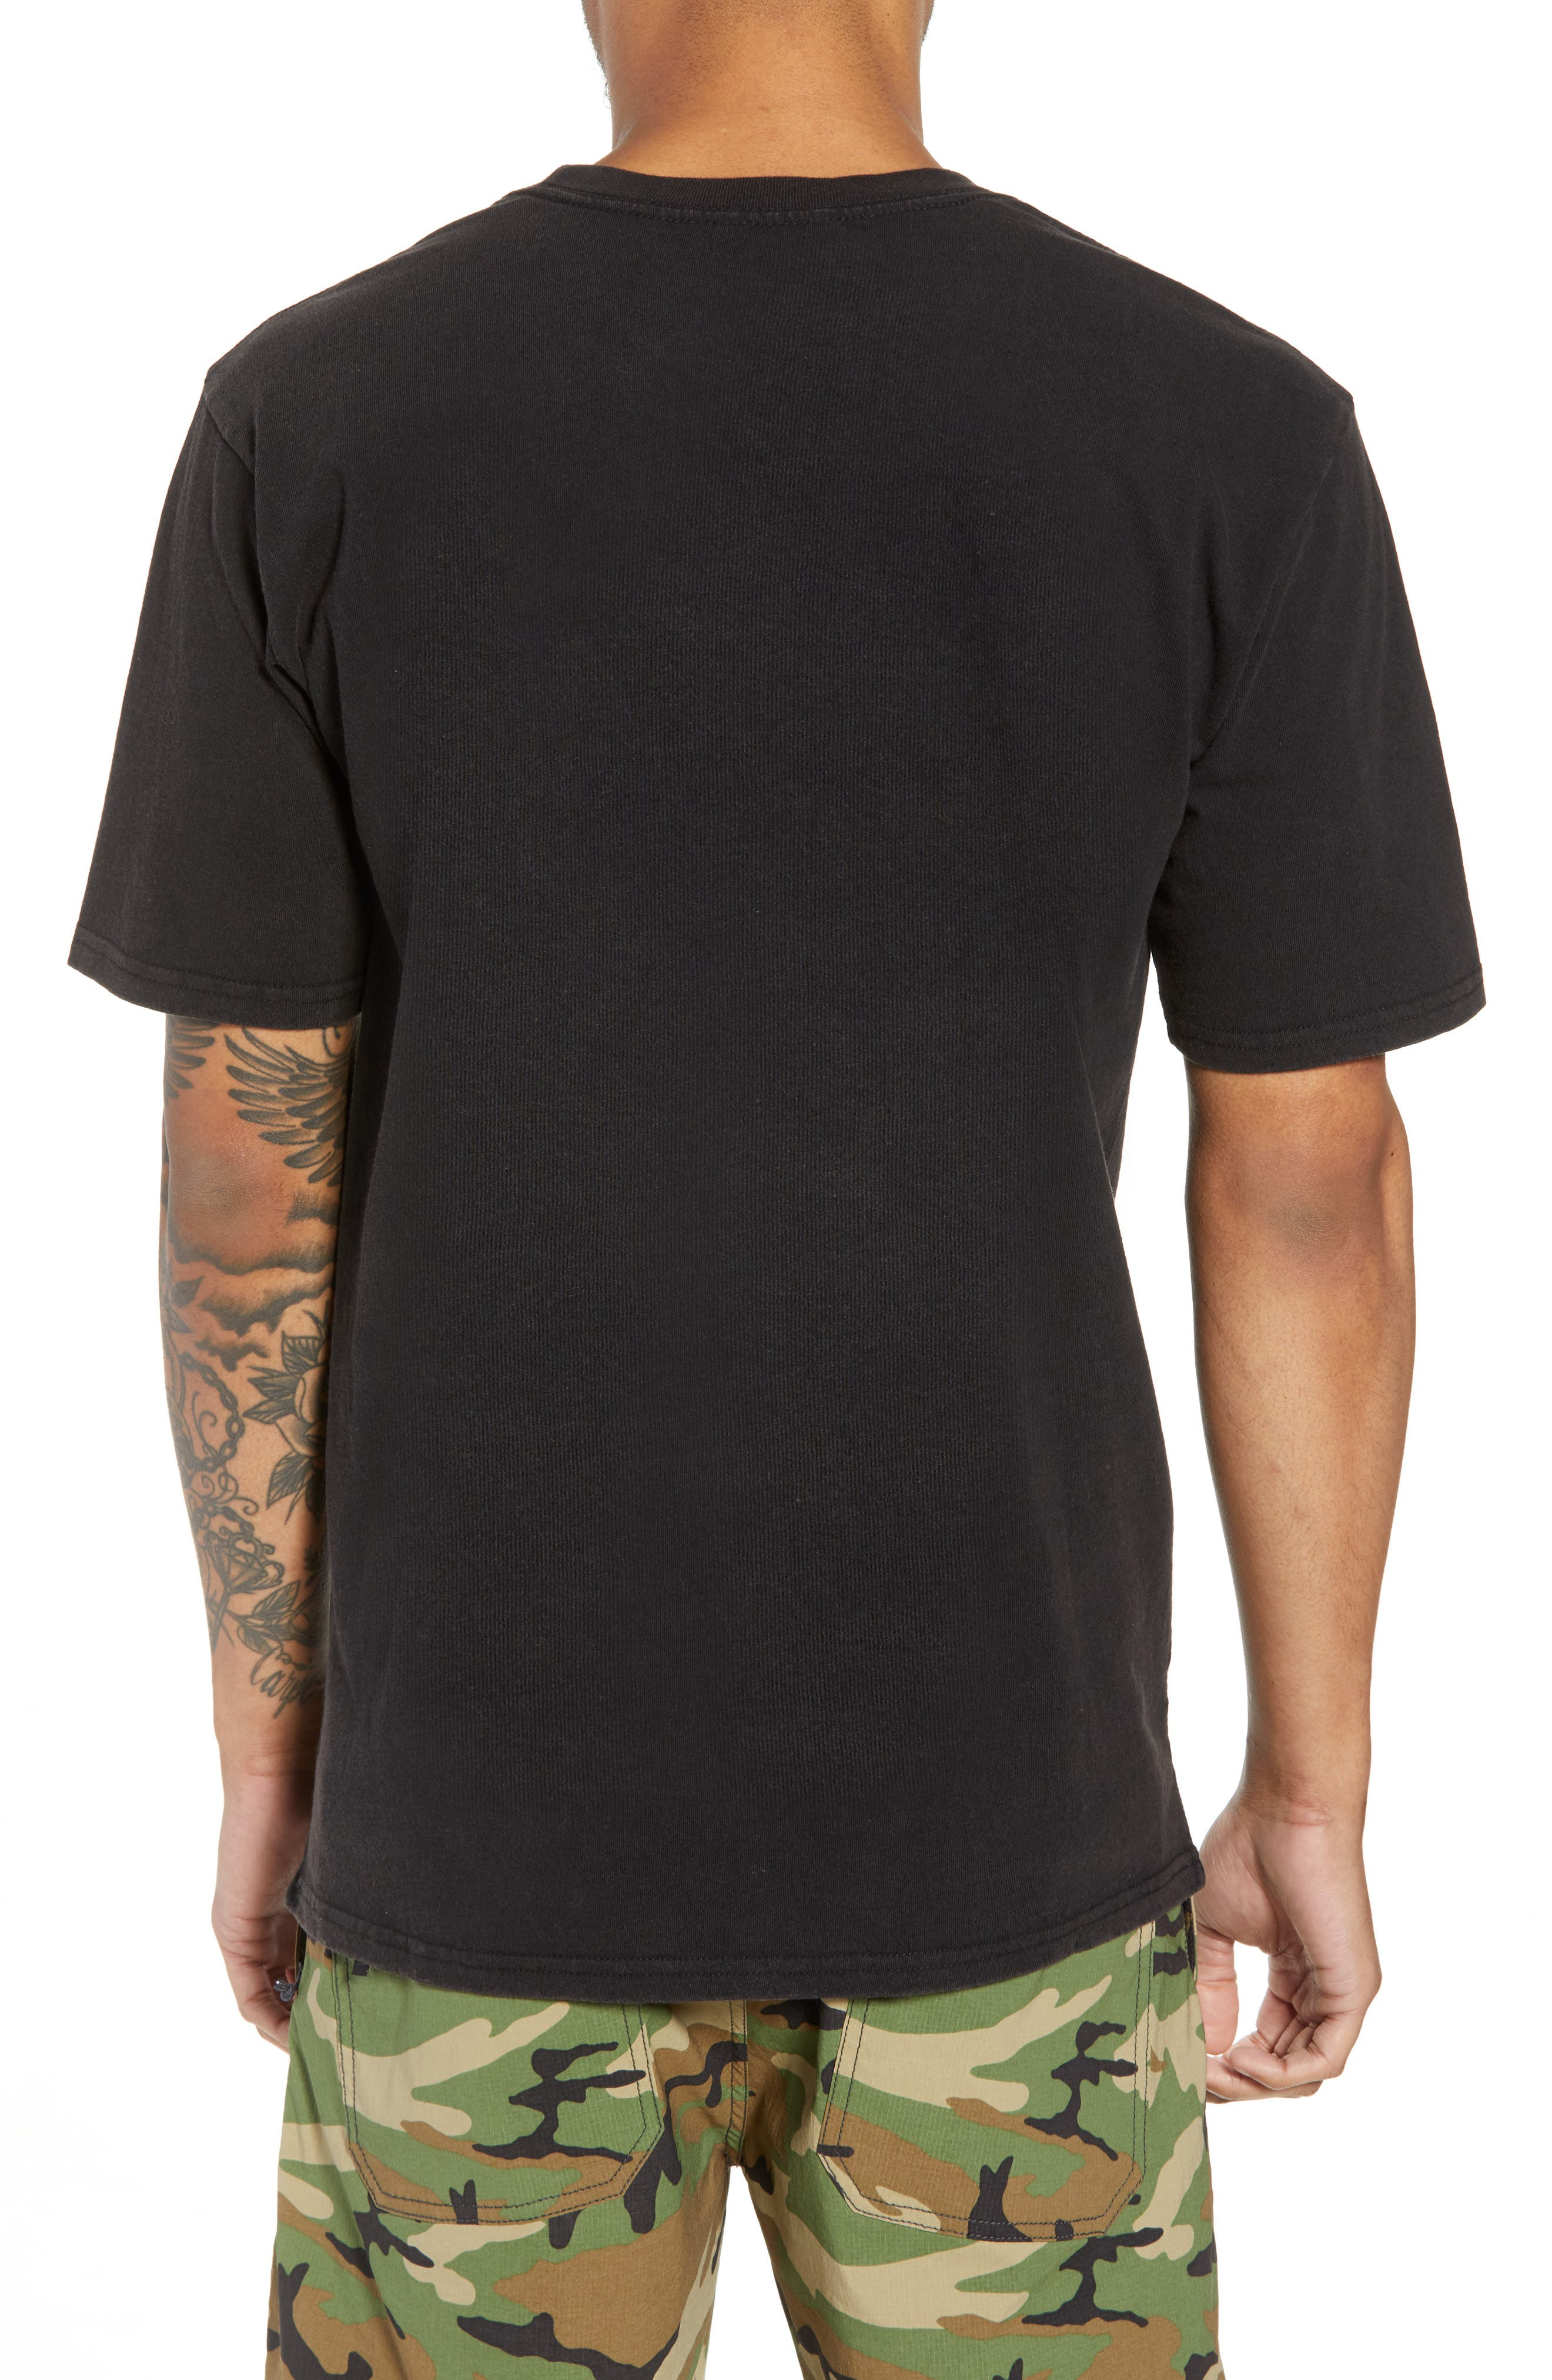 Rival II Graphic T-Shirt,                             Alternate thumbnail 2, color,                             Black/ White/ White